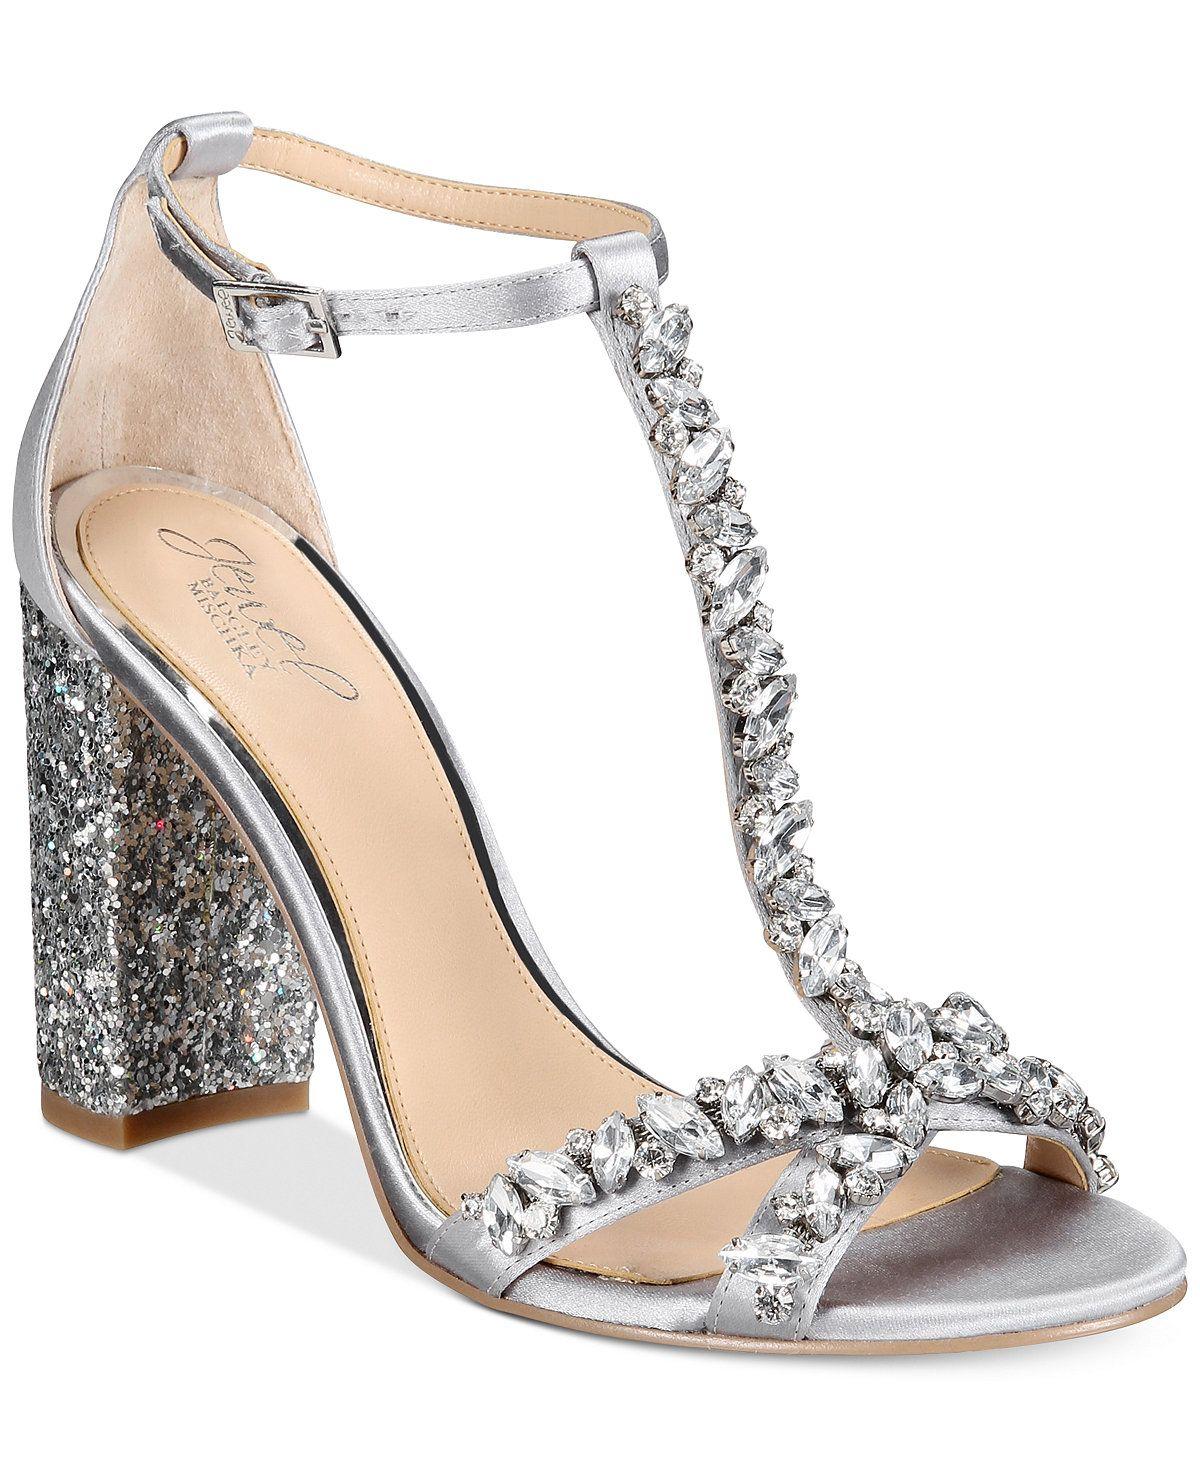 Evening sandals, Bridal shoes